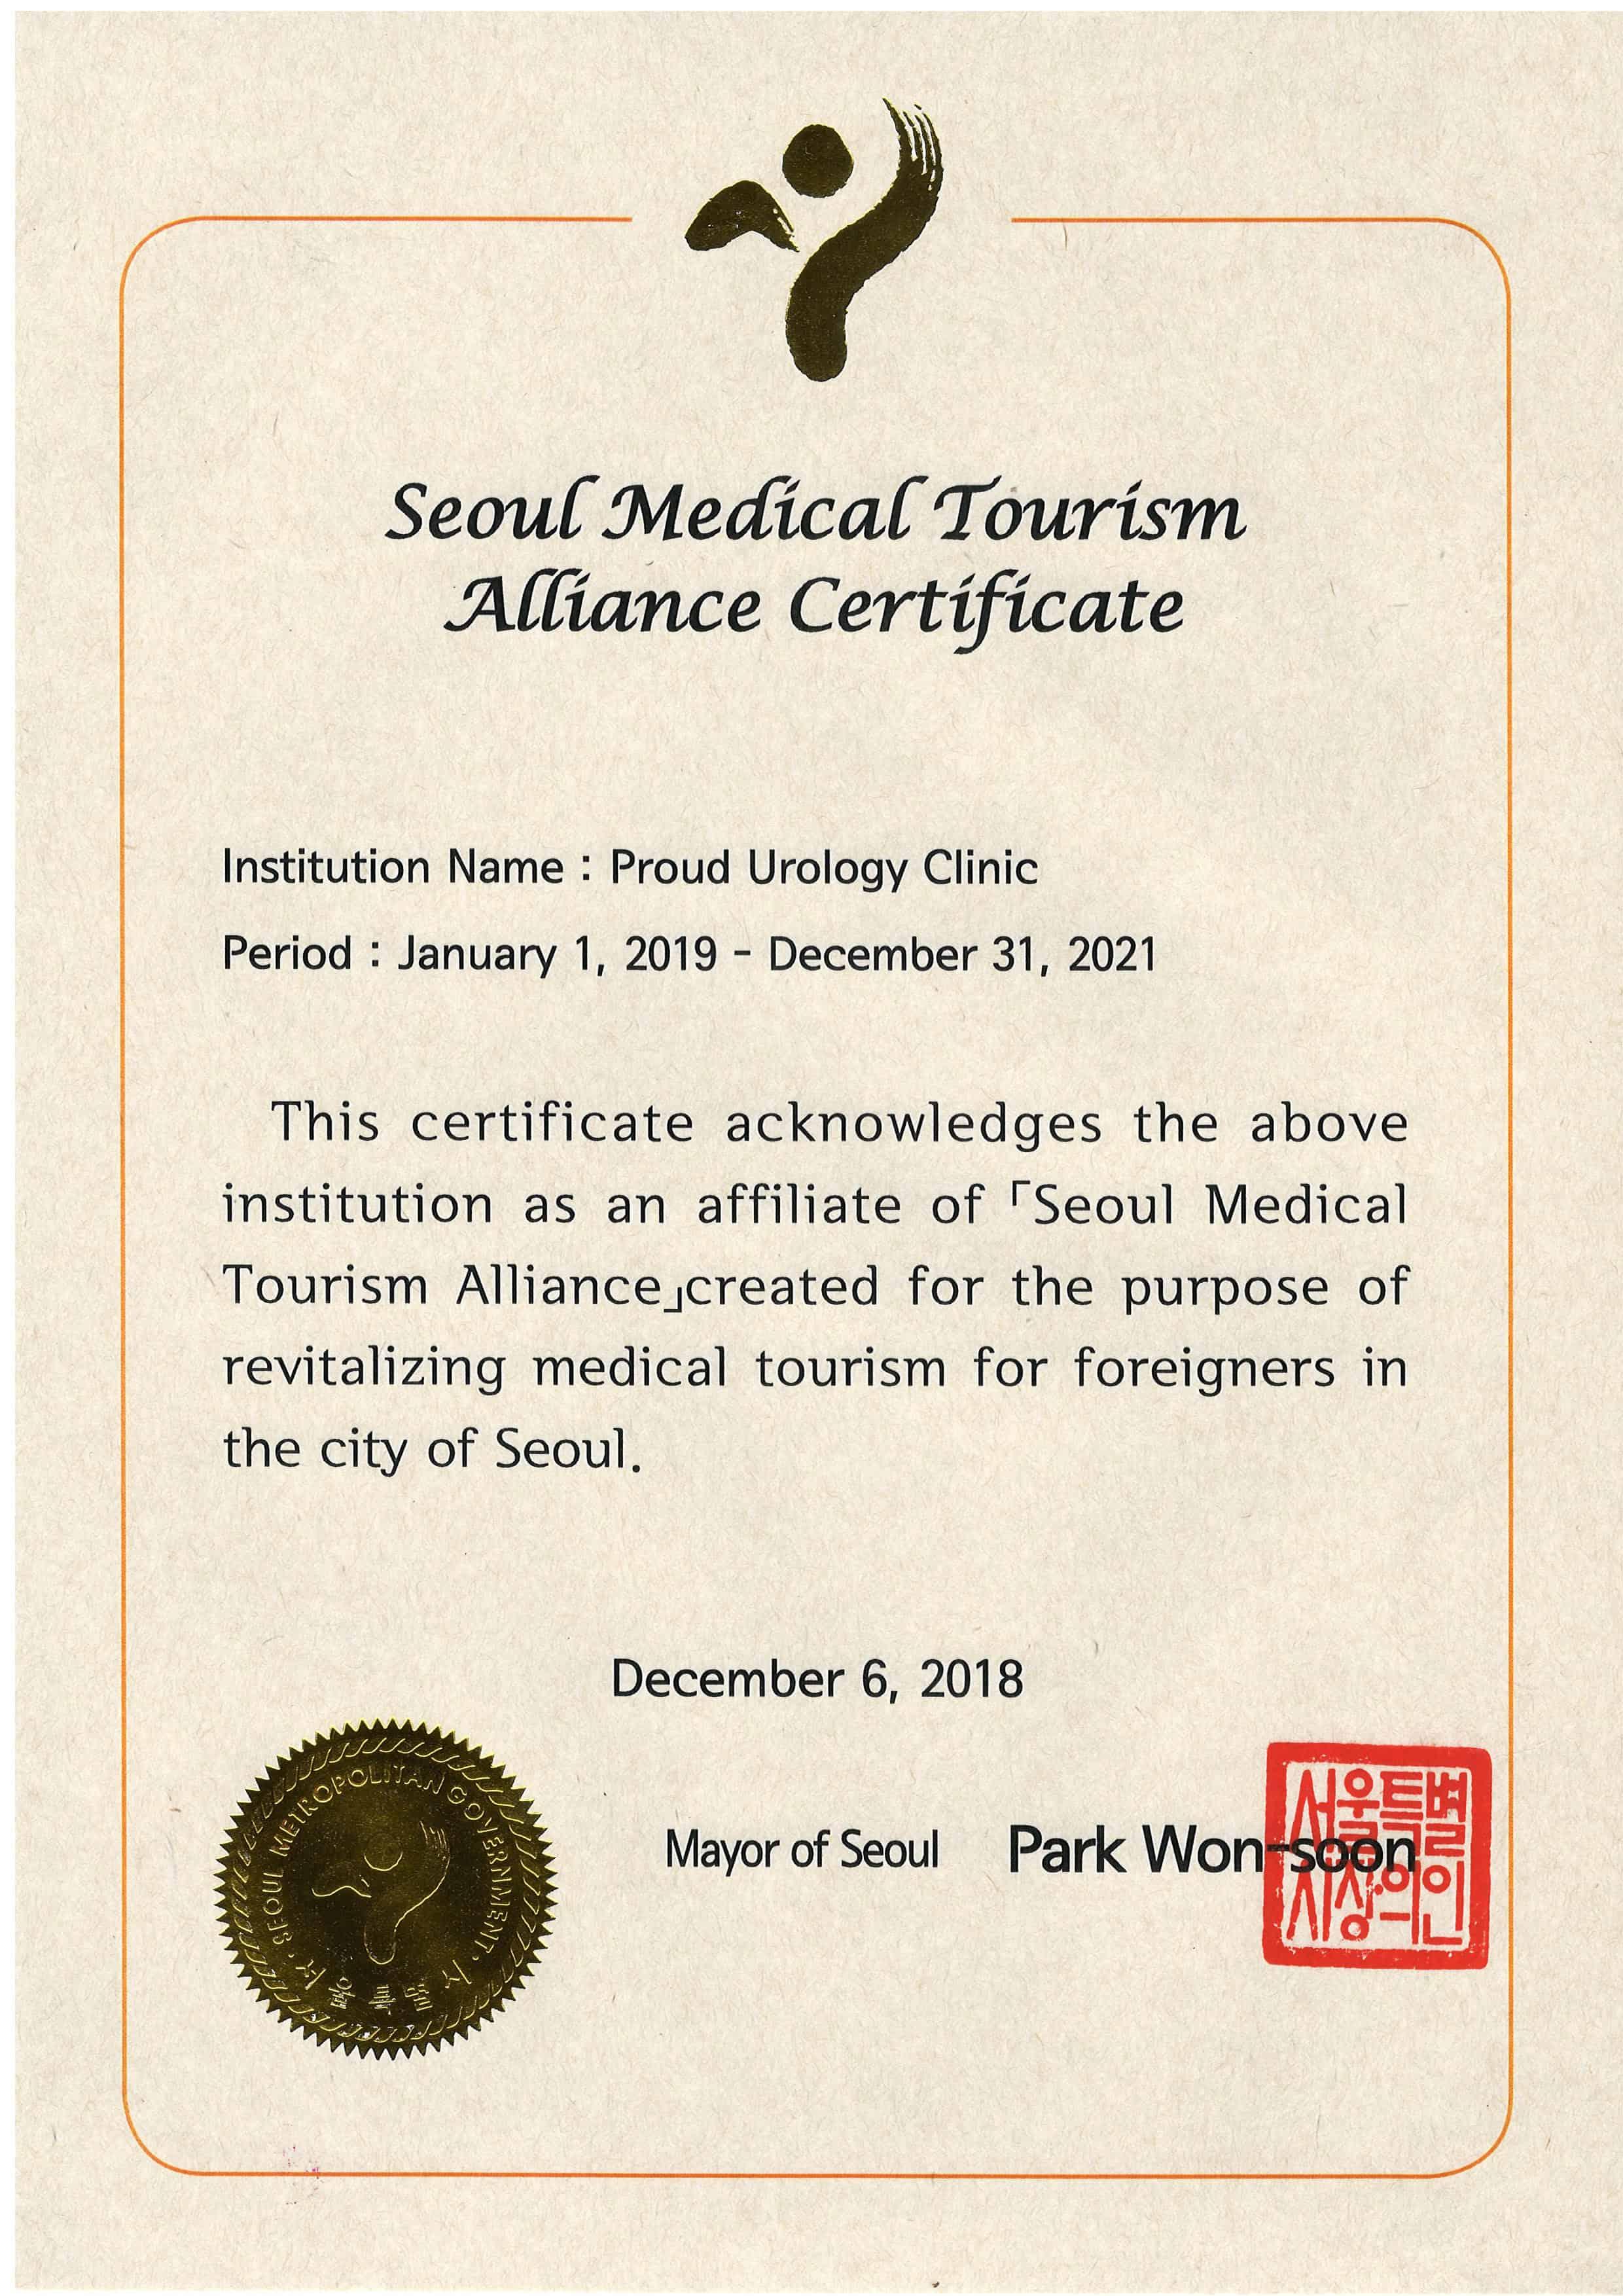 seoul medical tourism alliance certificate